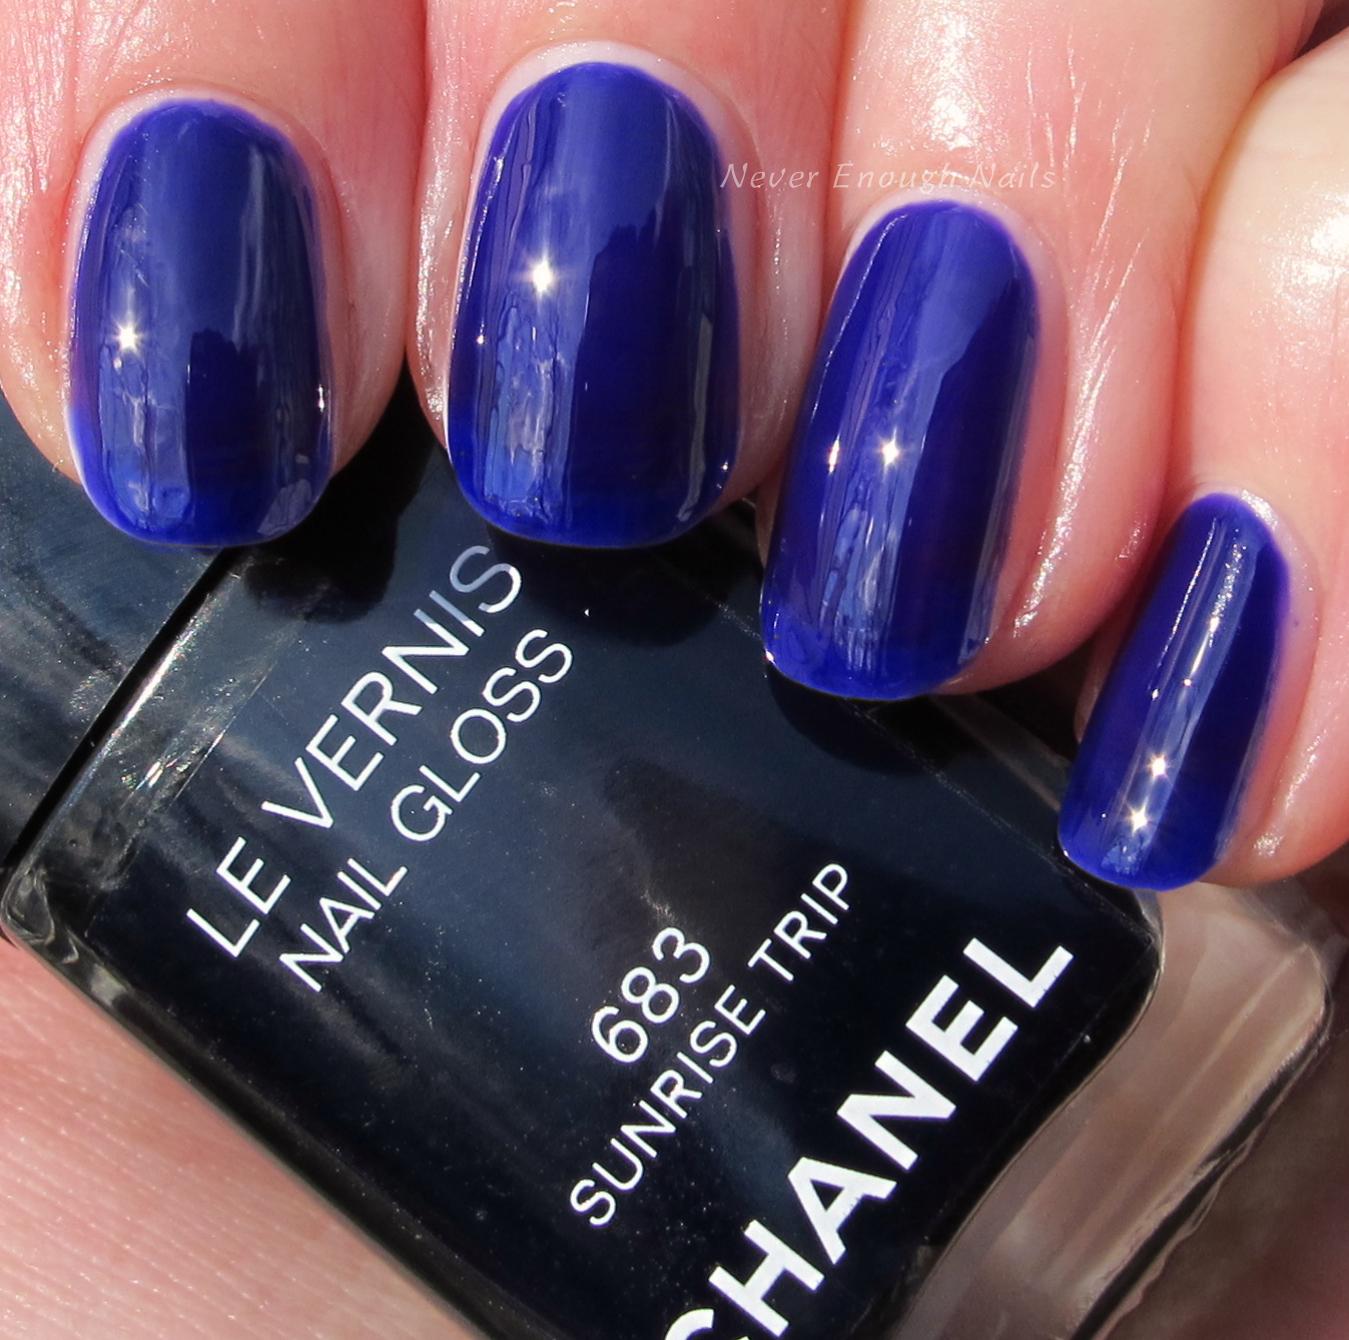 Never Enough Nails: Chanel Sunrise Trip